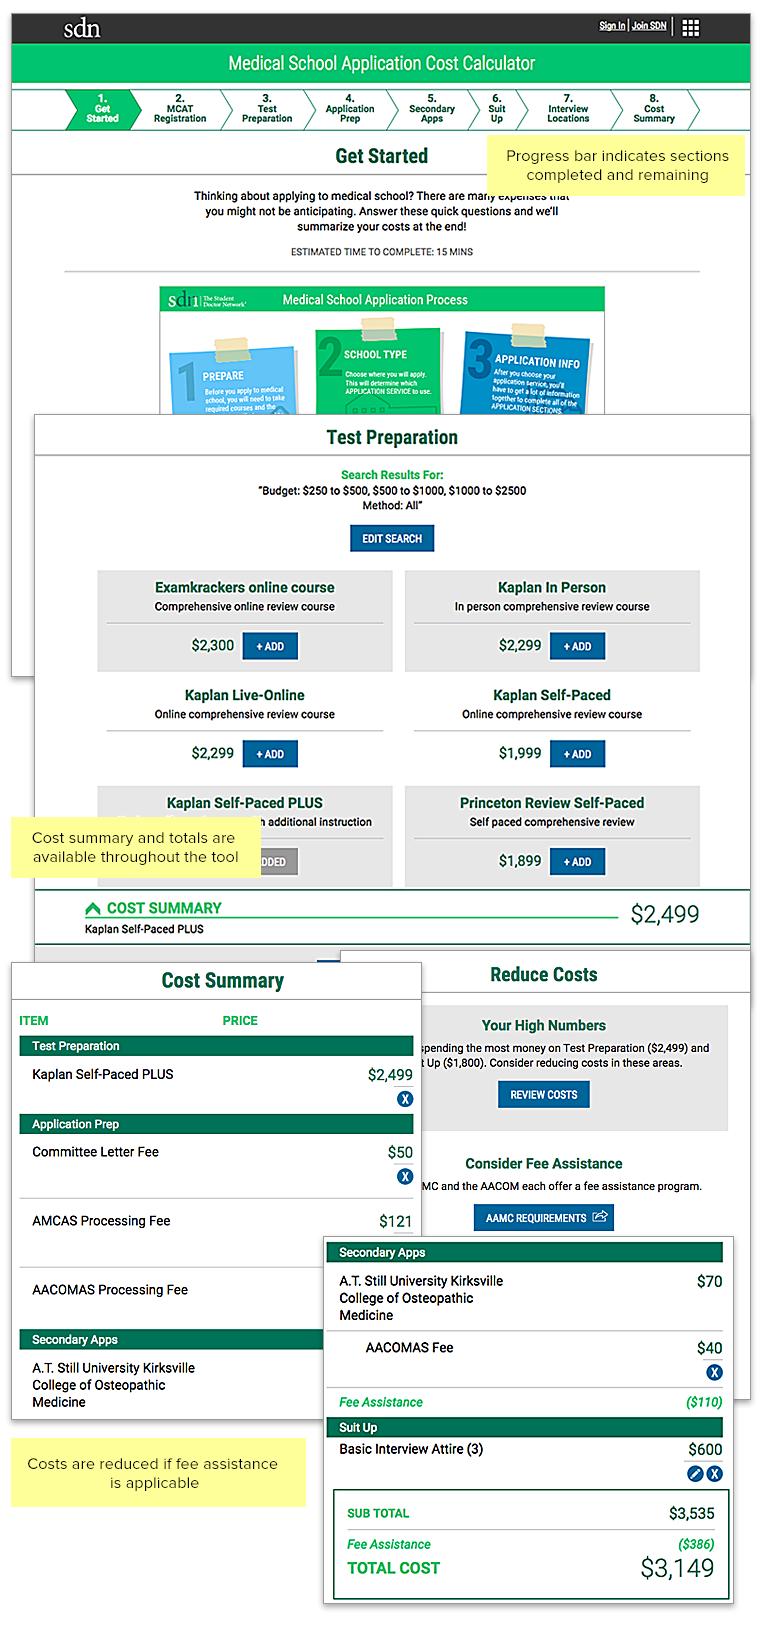 Product Design Work | Cost Calculator Web App